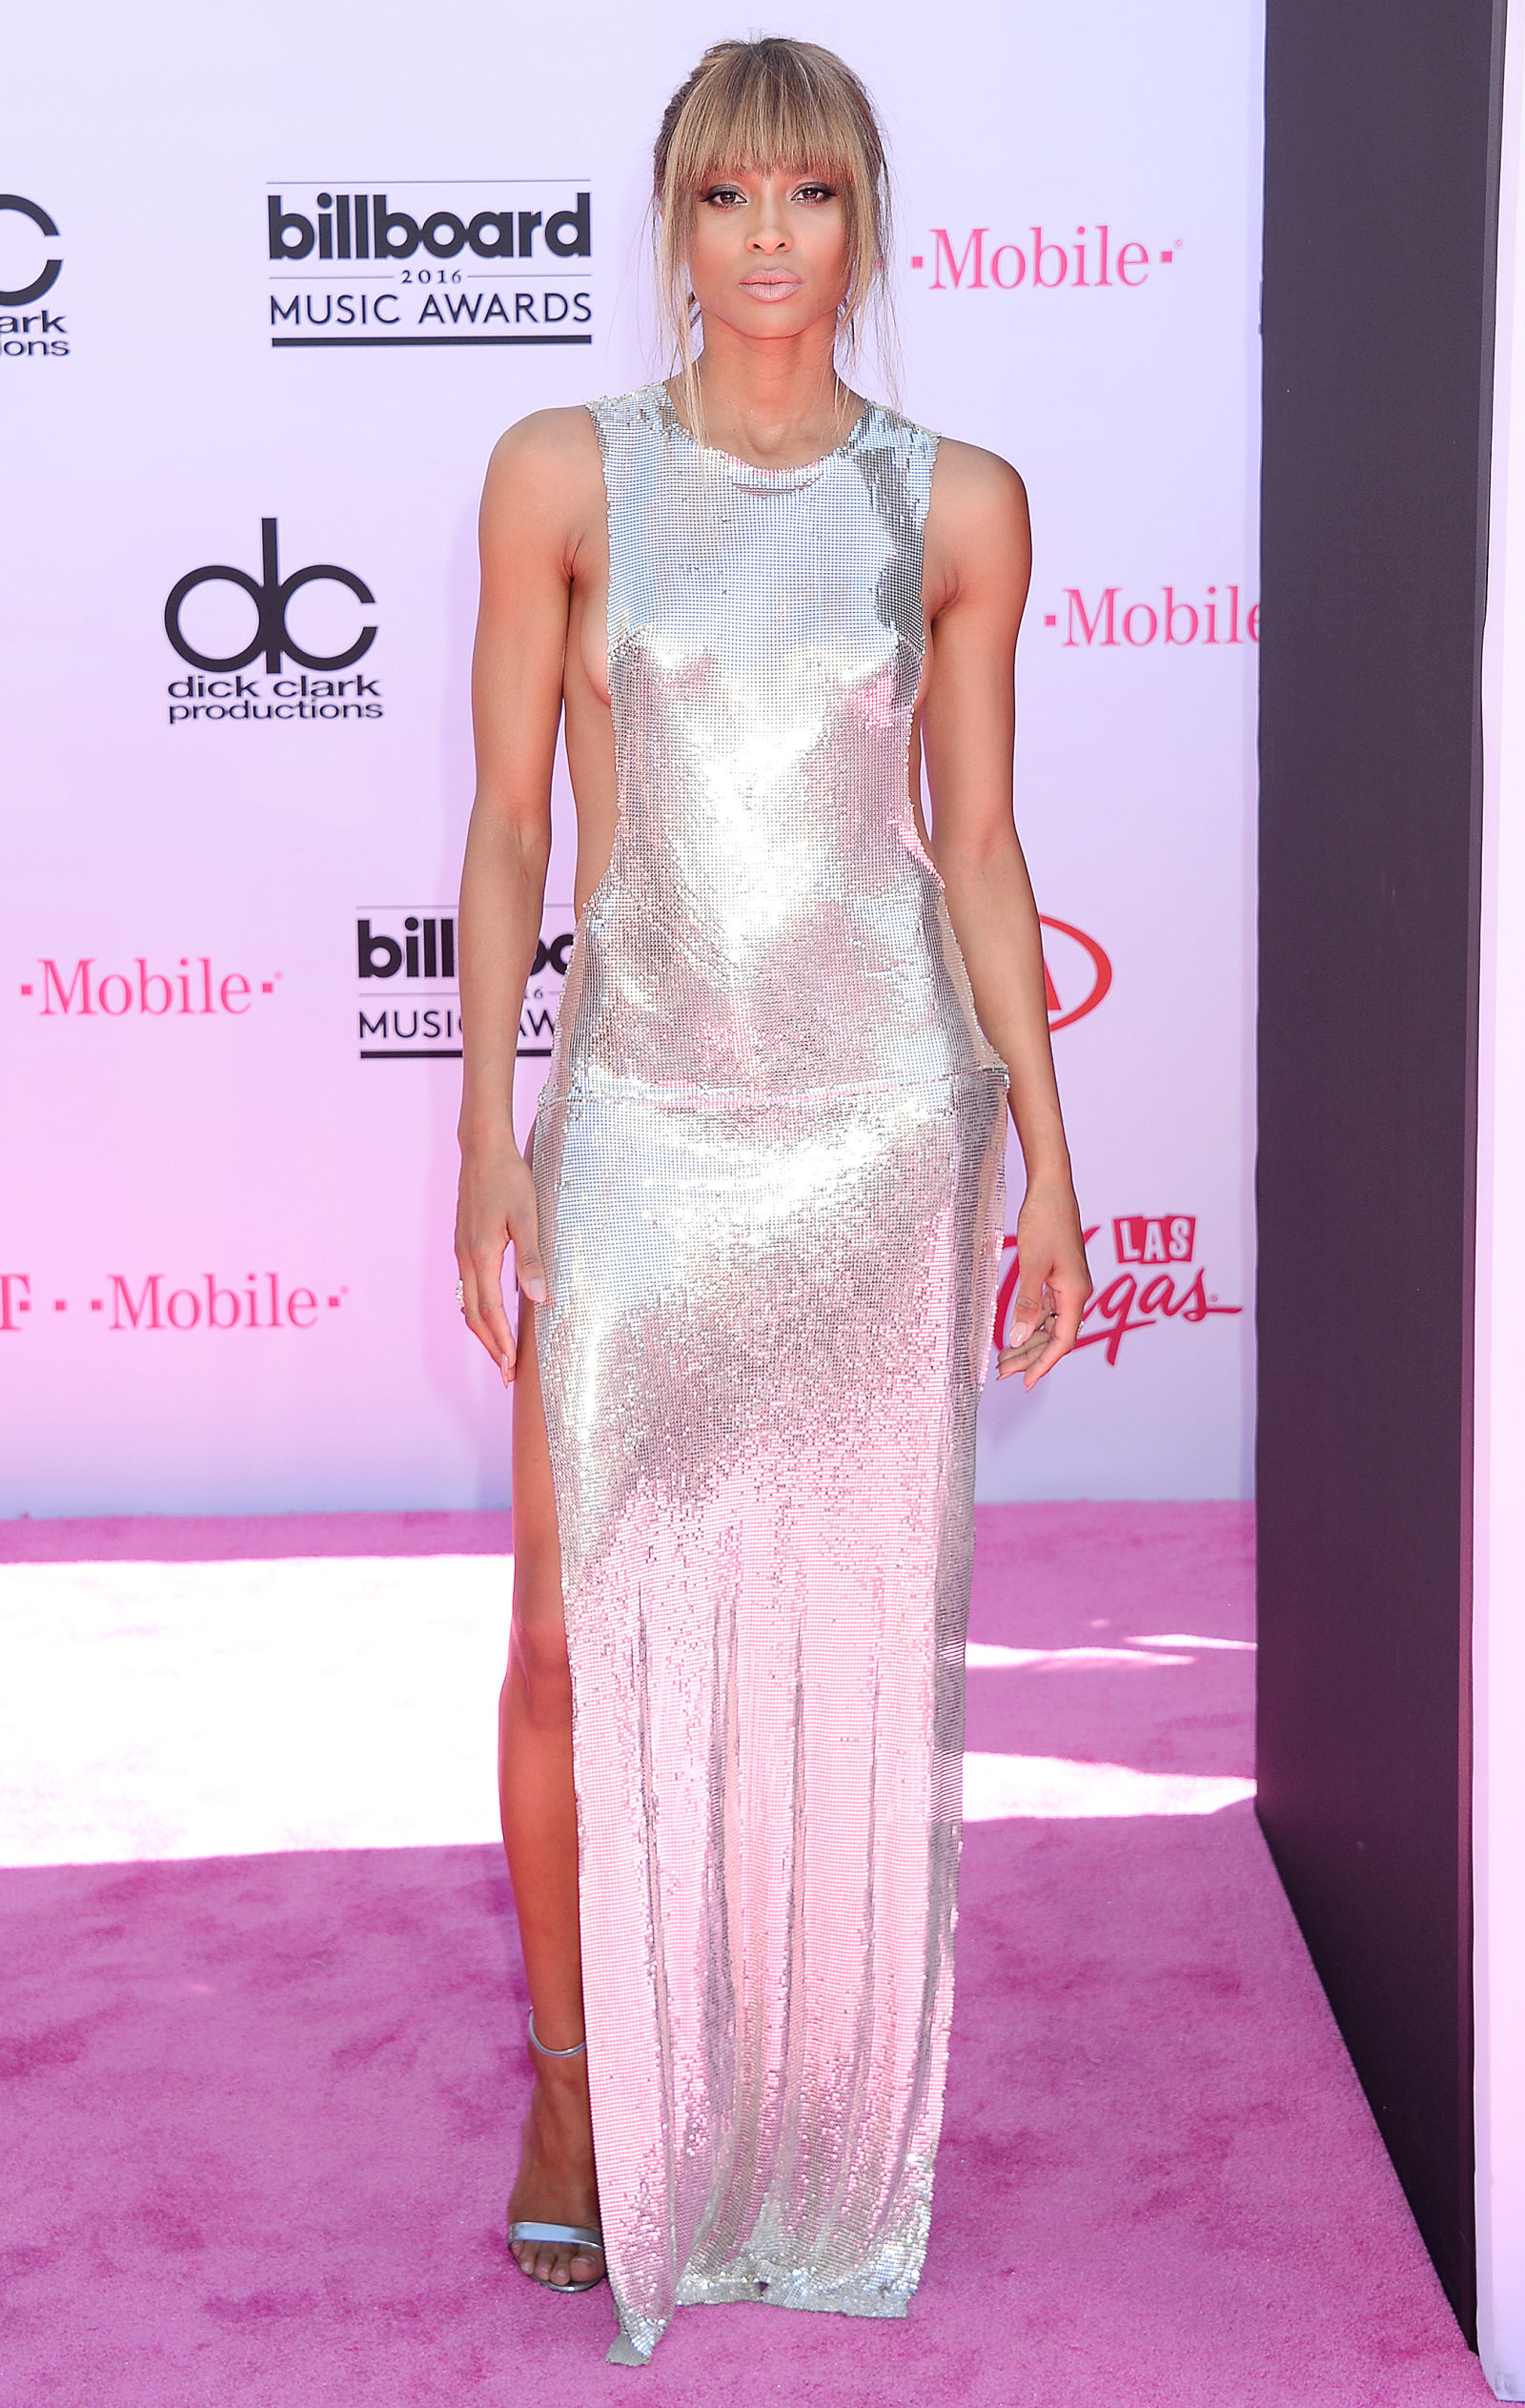 Ciara friges hairstyle at Billboards 2016